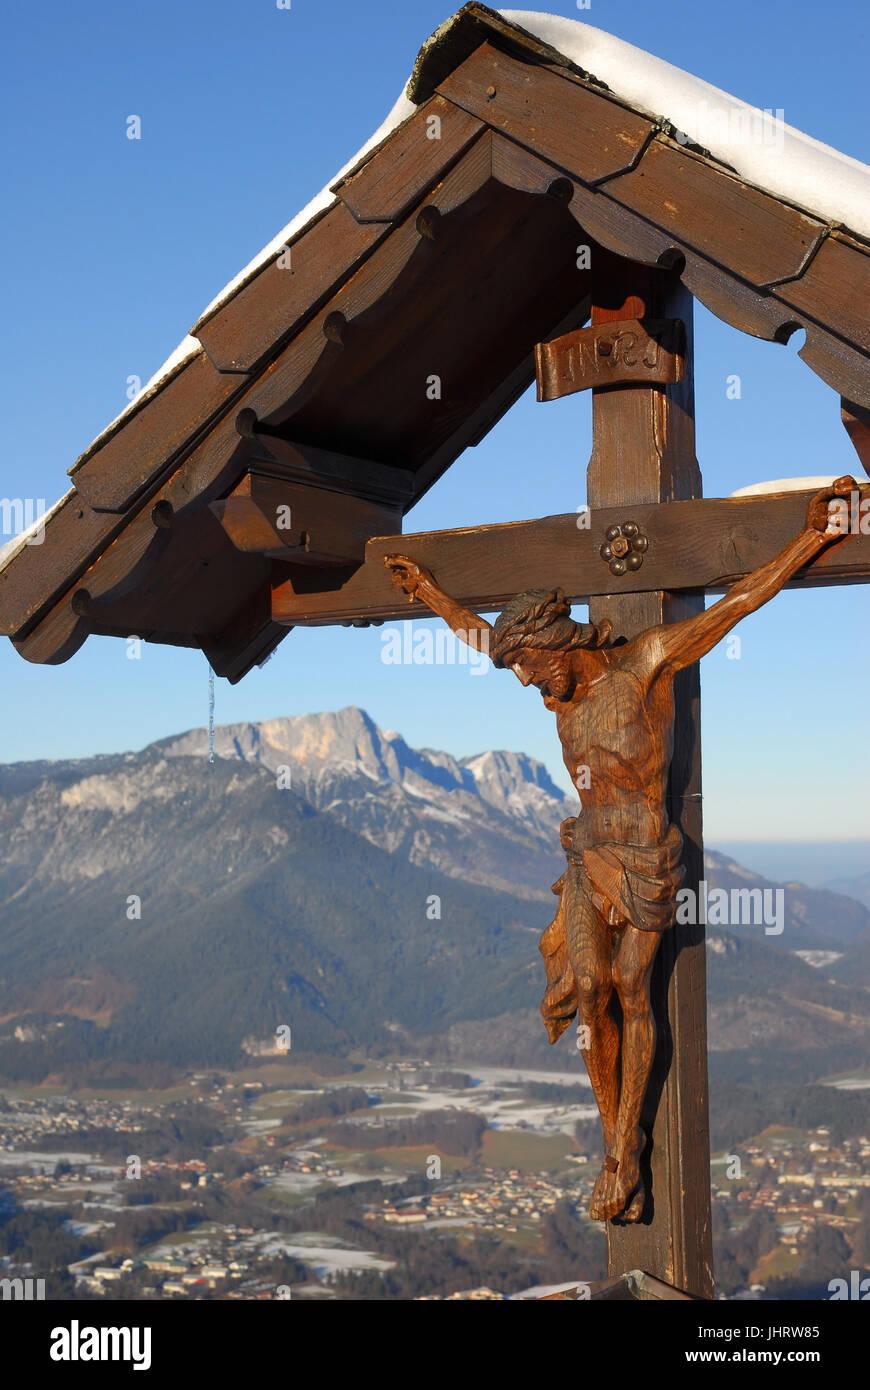 Camino del Calvario, el hombre Dios la cruz - la cruz de Jesús, Herrgottkreuz Jesuskreuz Wegkreuz - - Foto de stock